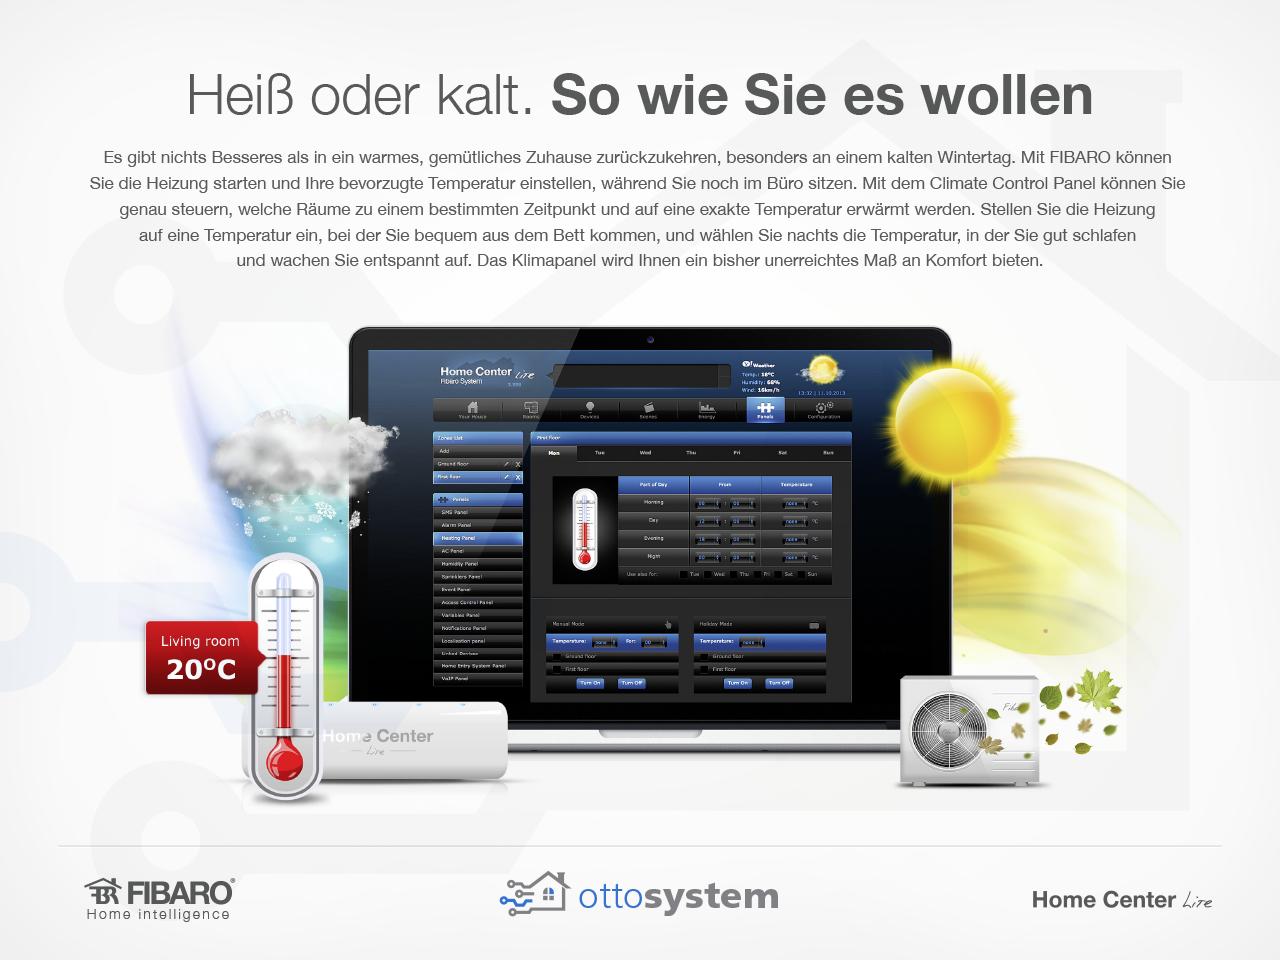 Pr-sentation_HCL_ottosystem-12